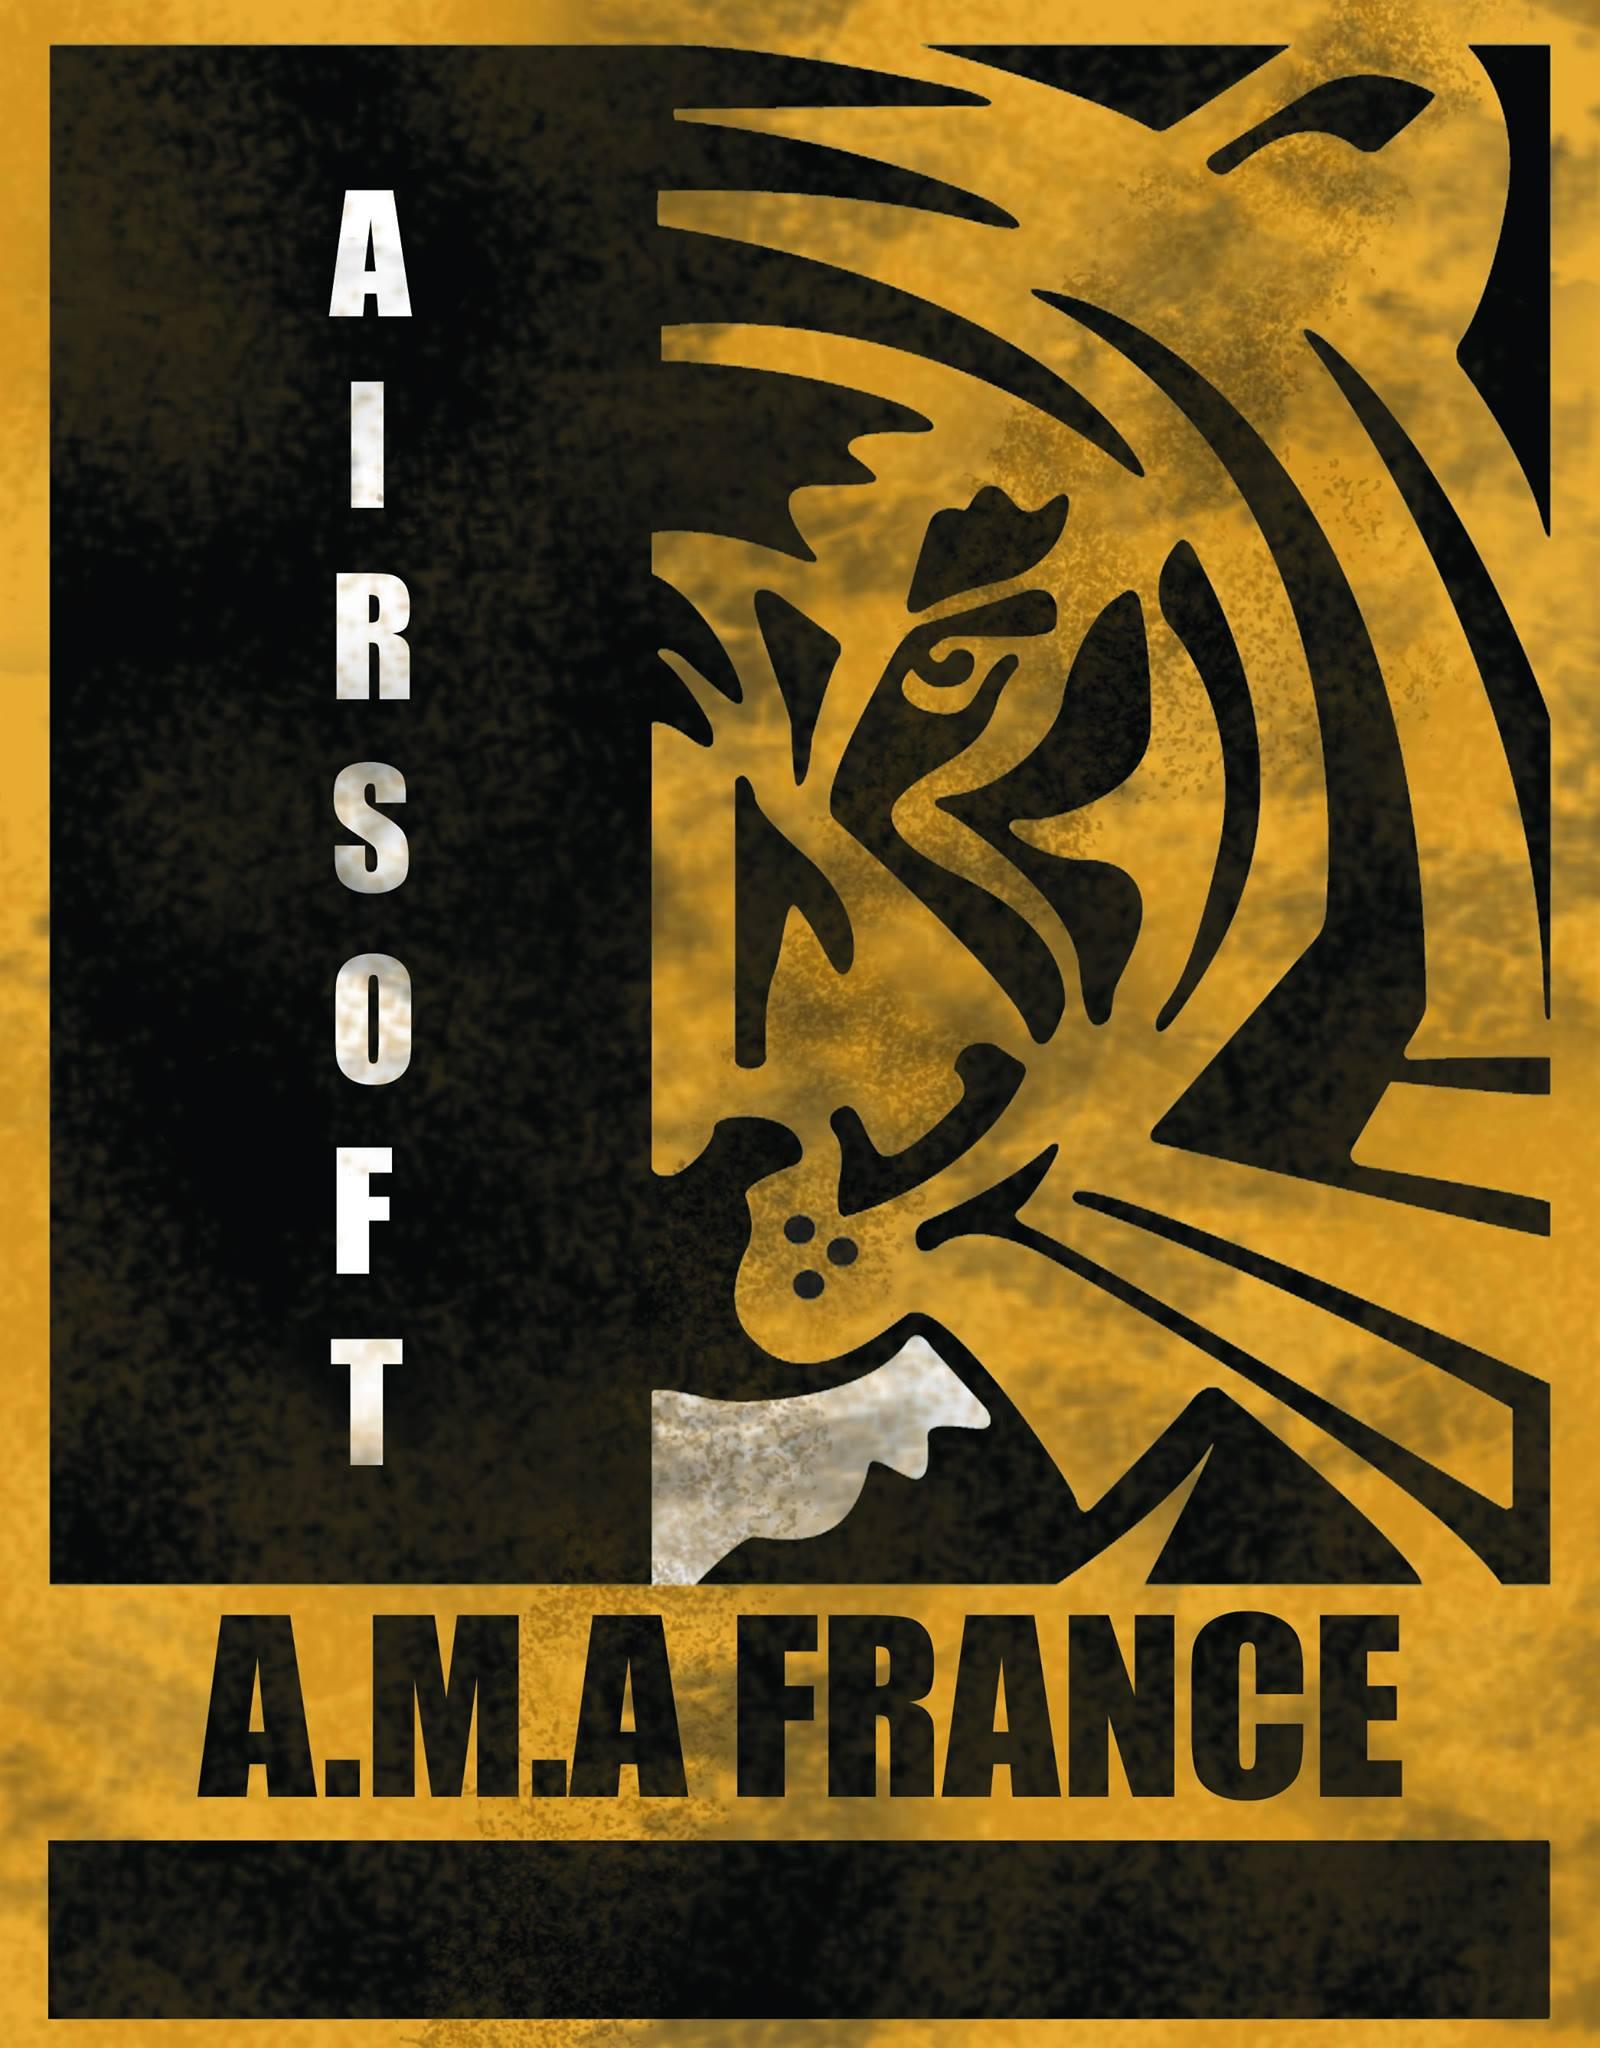 AMA France Airsoft